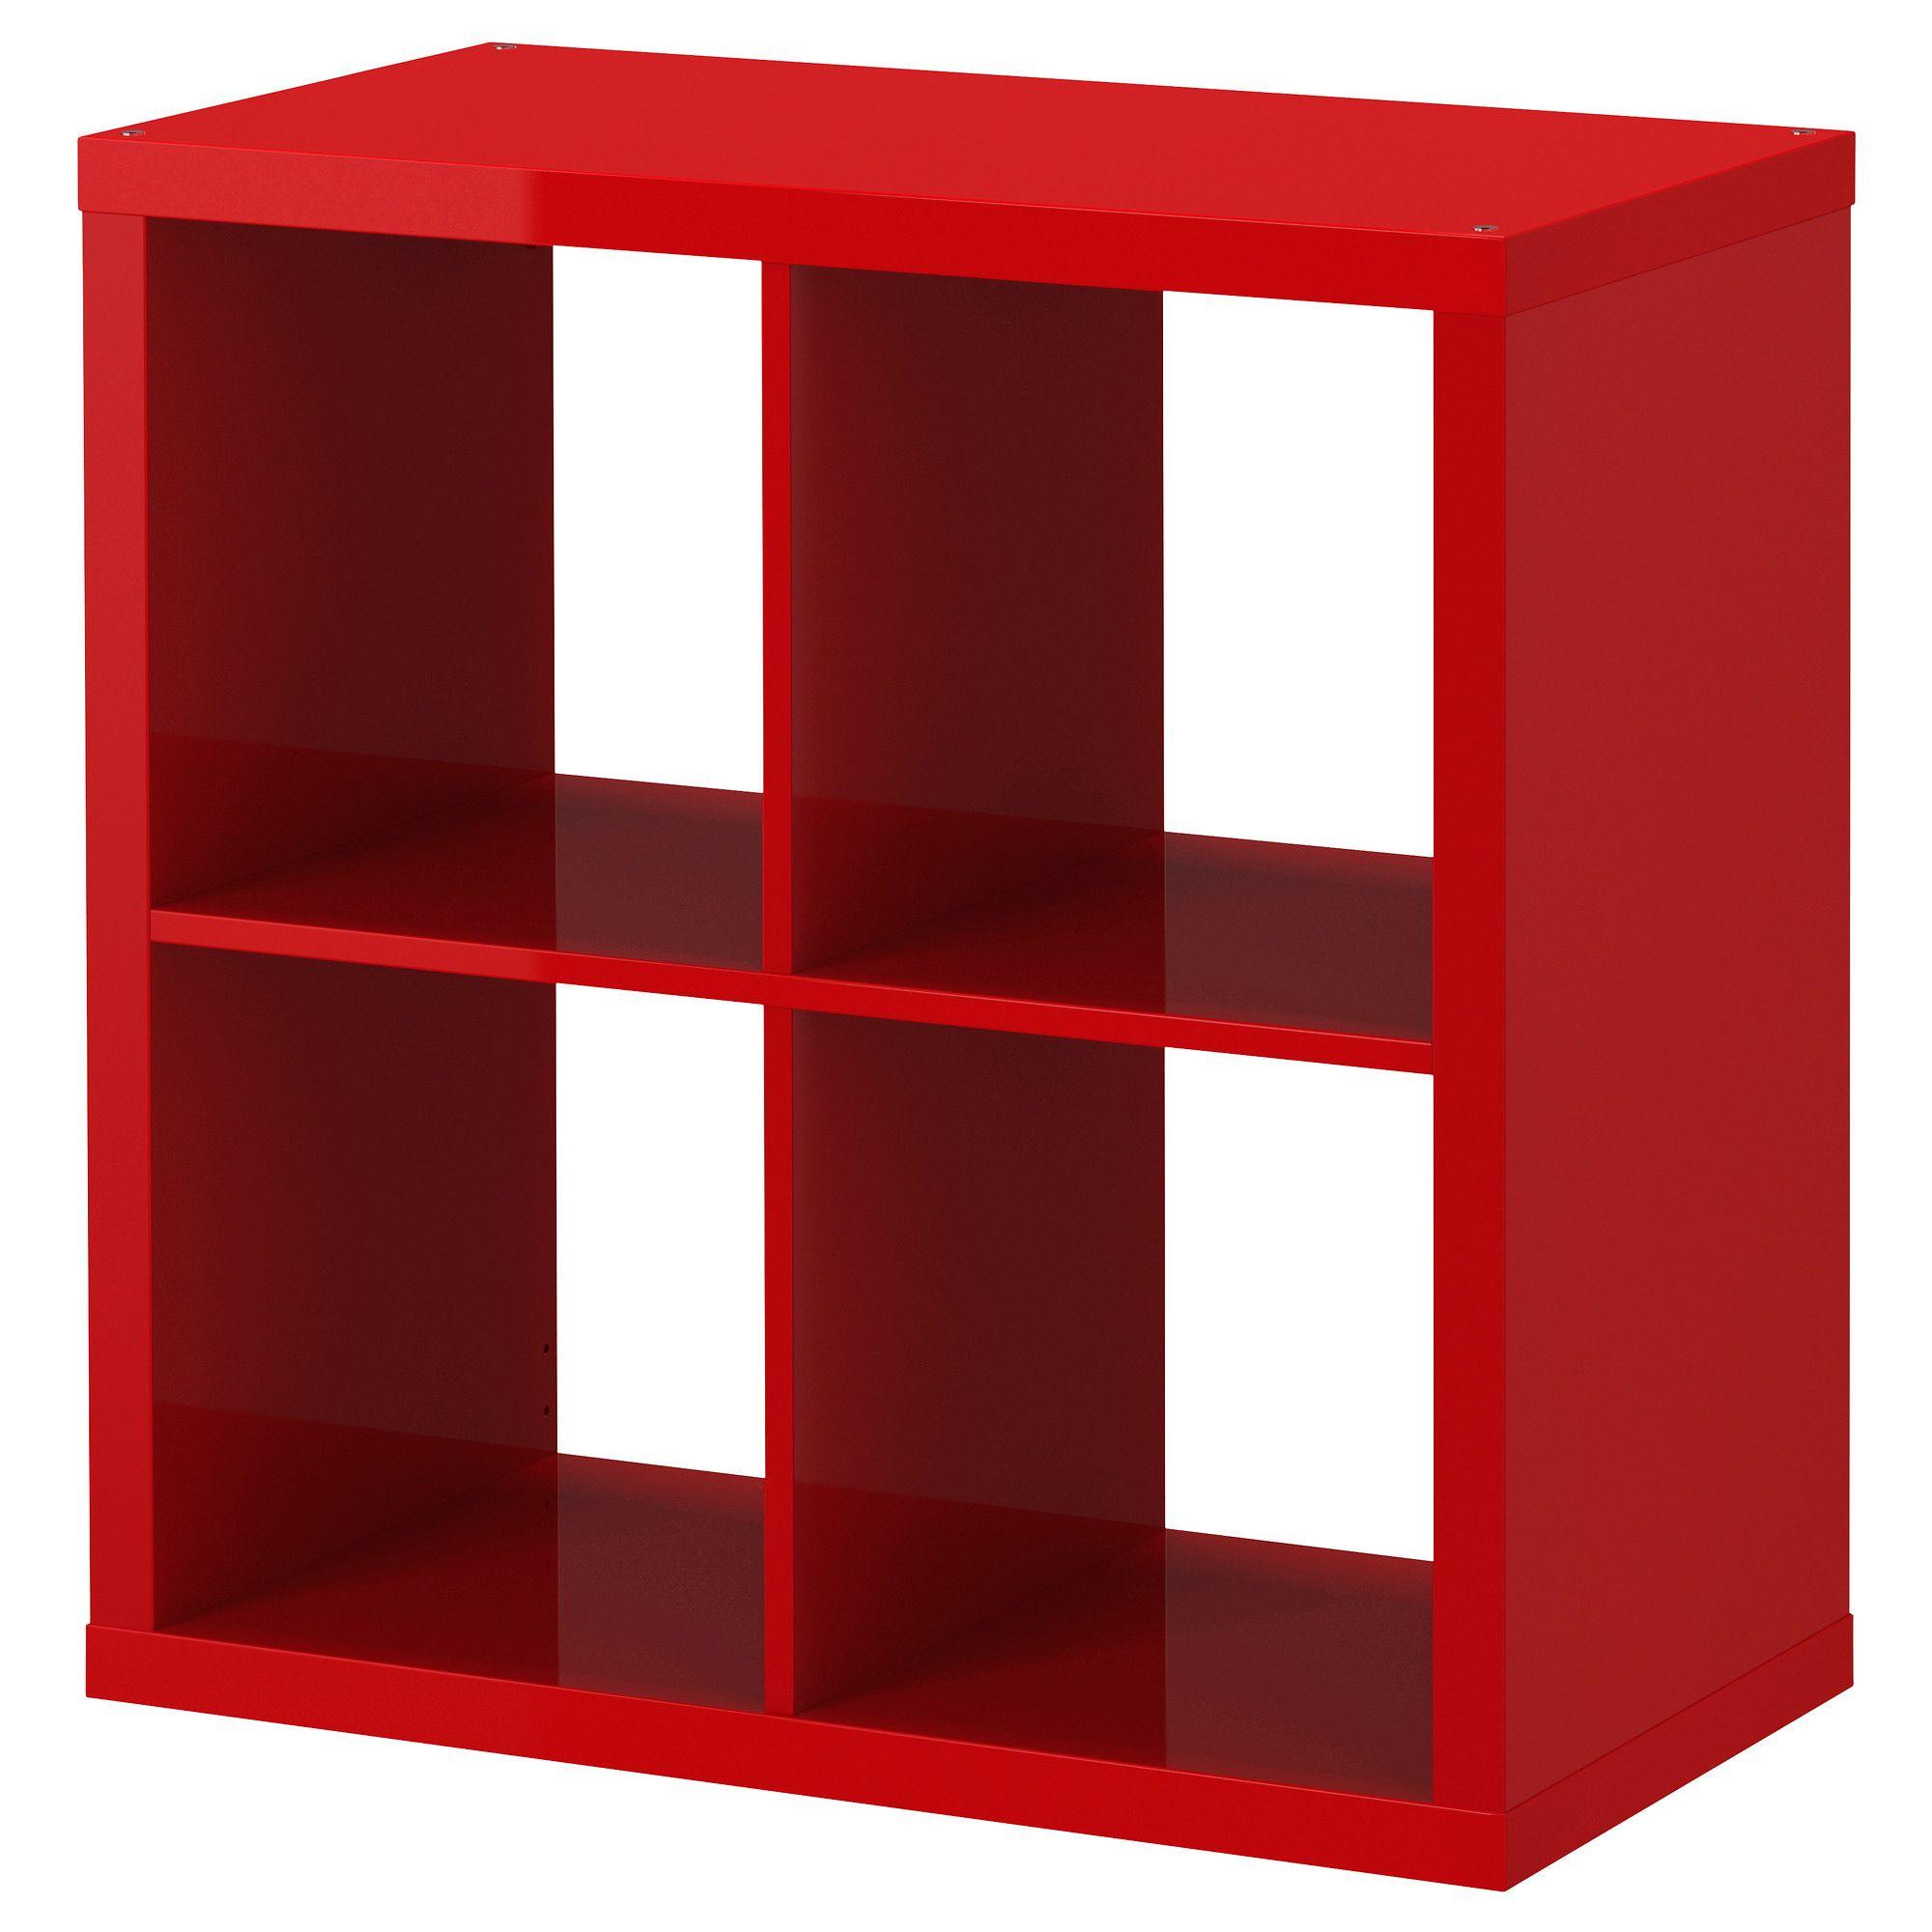 Furniture And Home Furnishings Kallax Shelving Unit Shelving